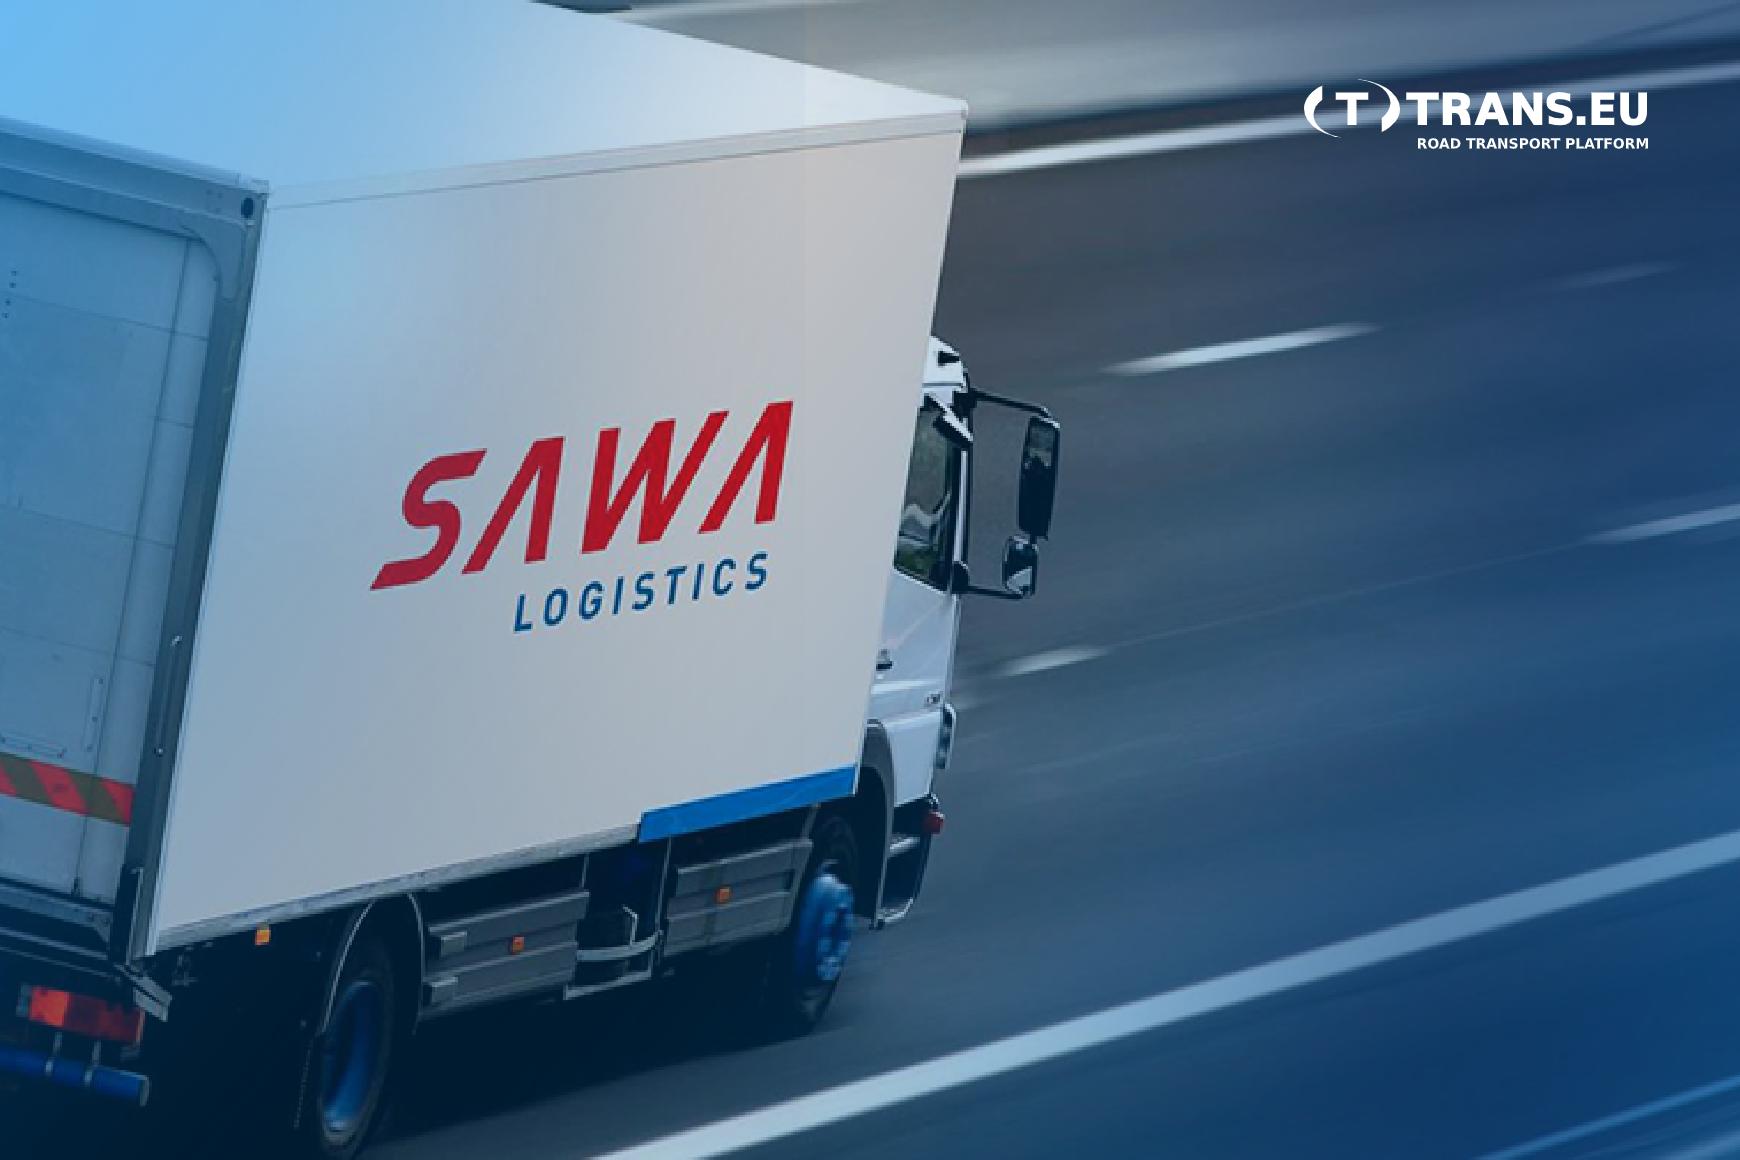 Транспортировка груза для Black Hawk на Эверест. Sawa Logistics объясняет важность скорости доставки